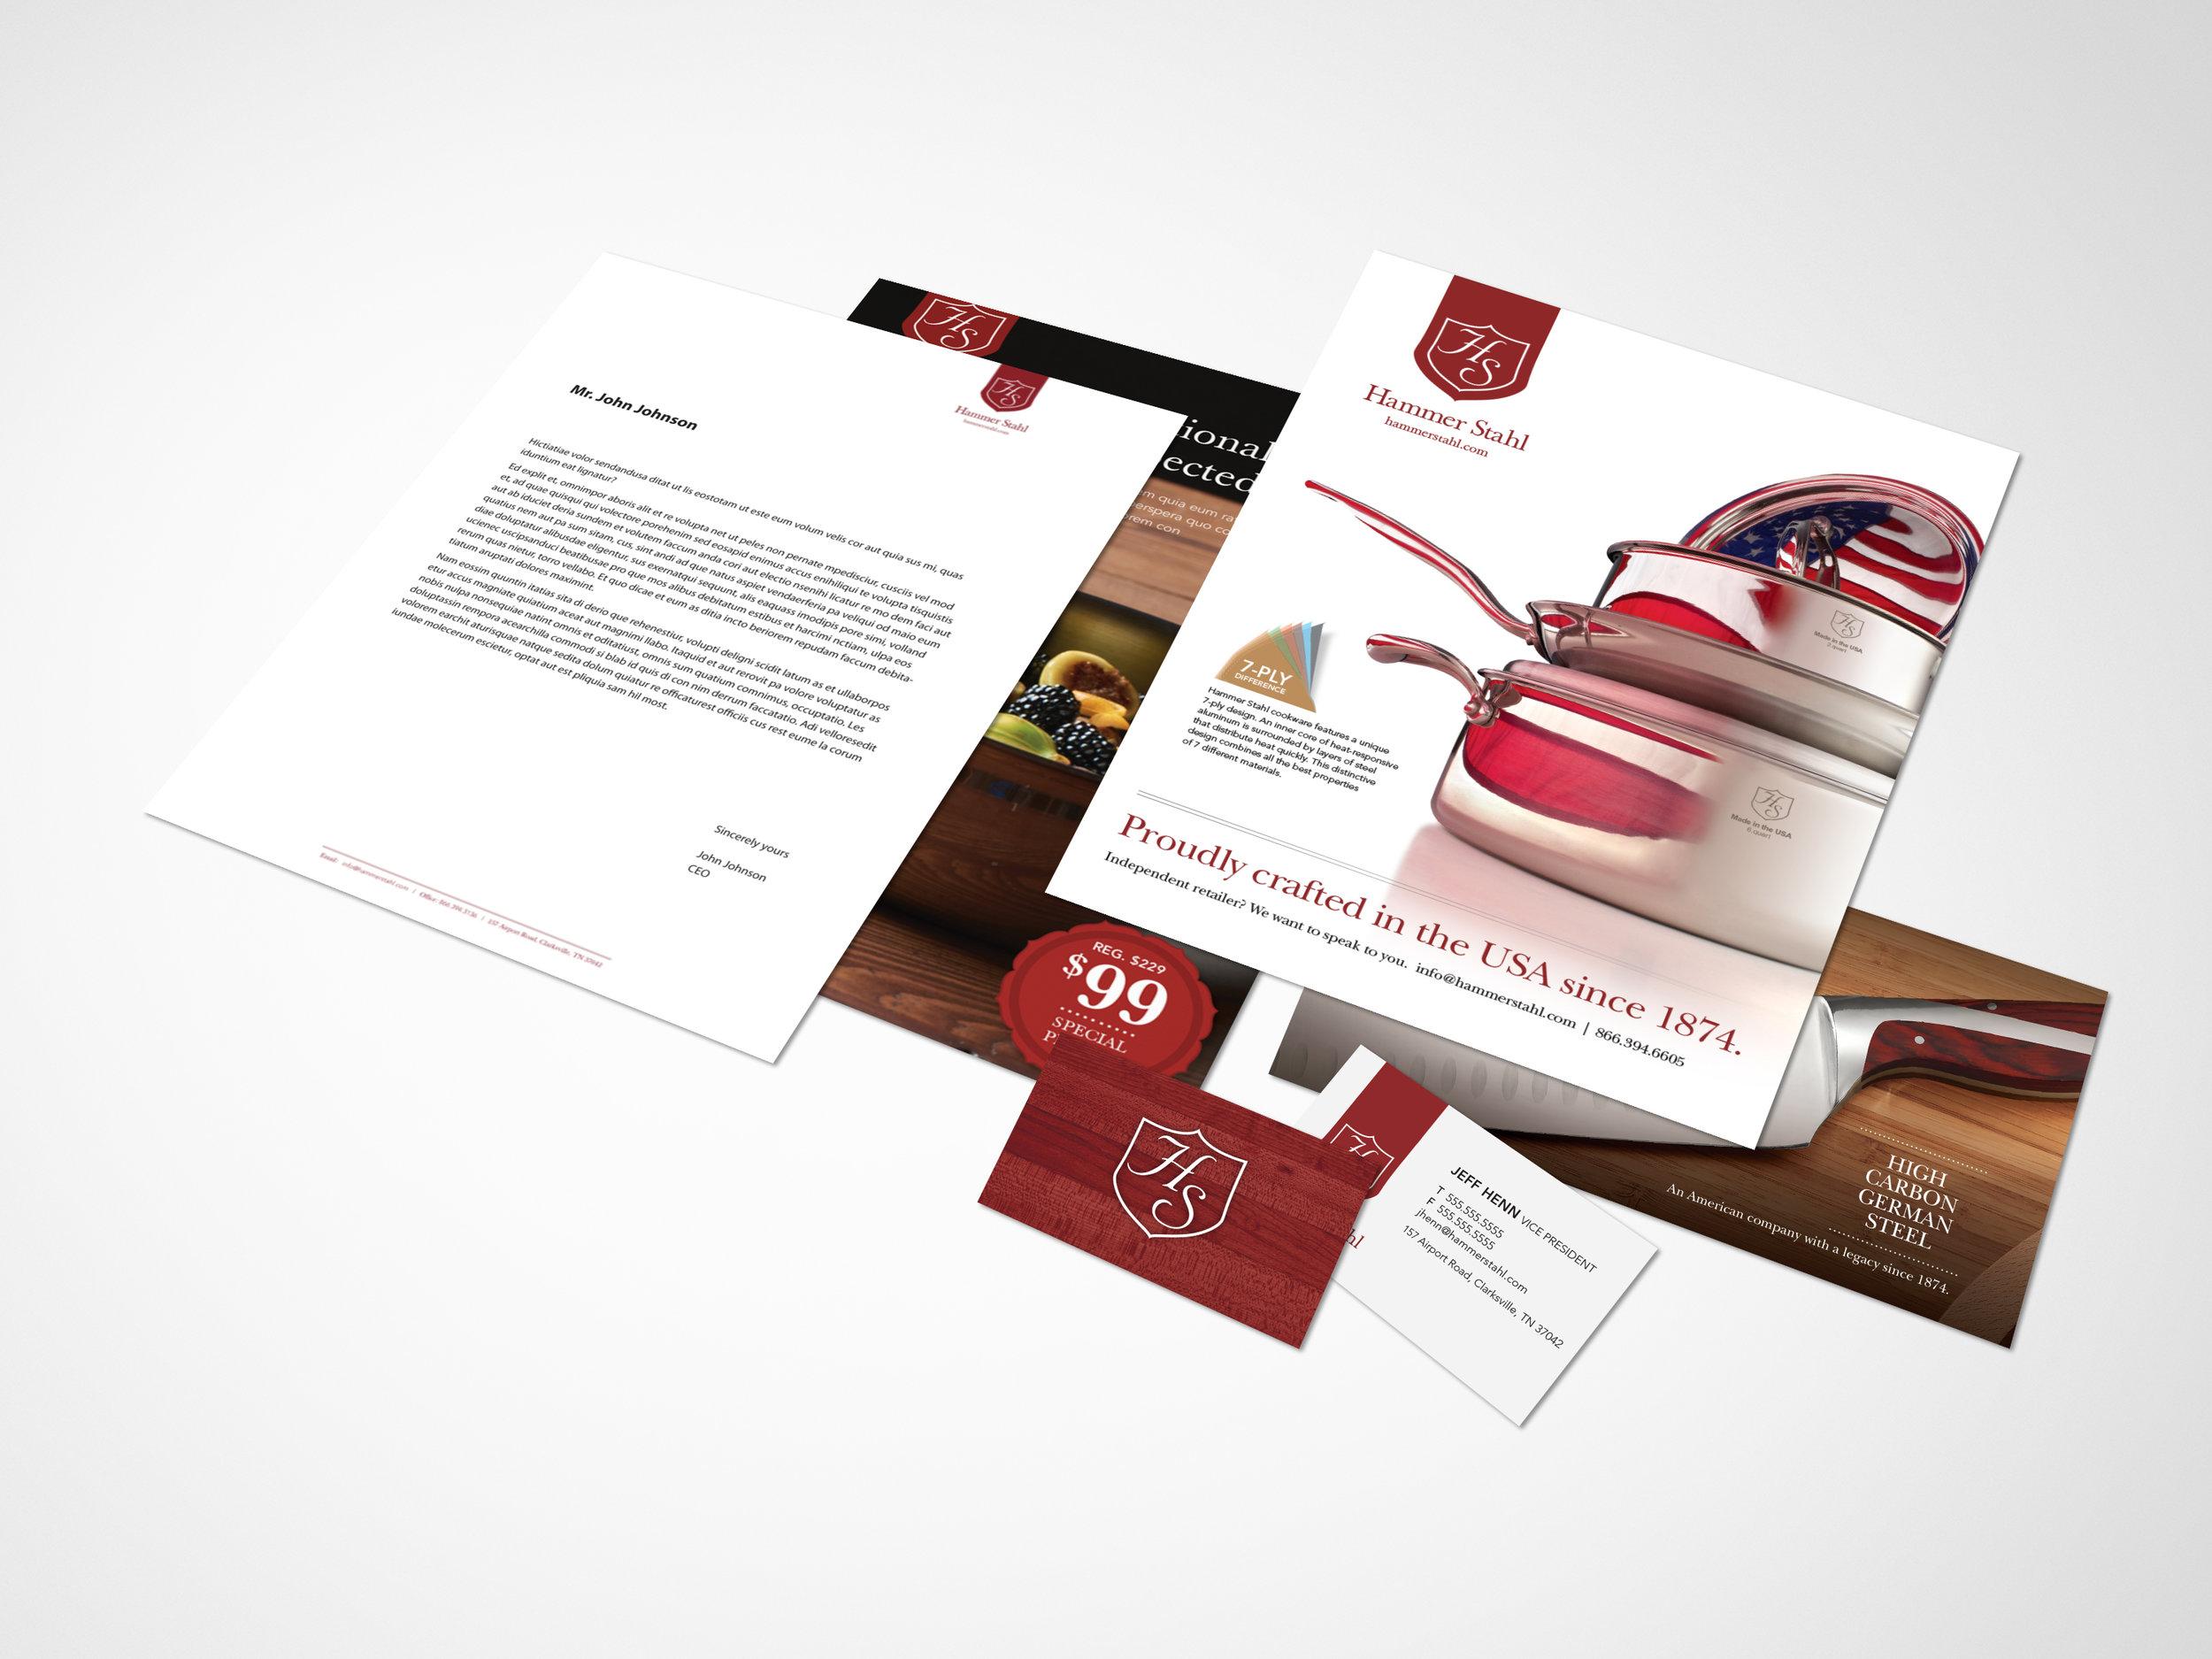 creativemccoy-design-hammerstahl-brand-identity-4.jpg